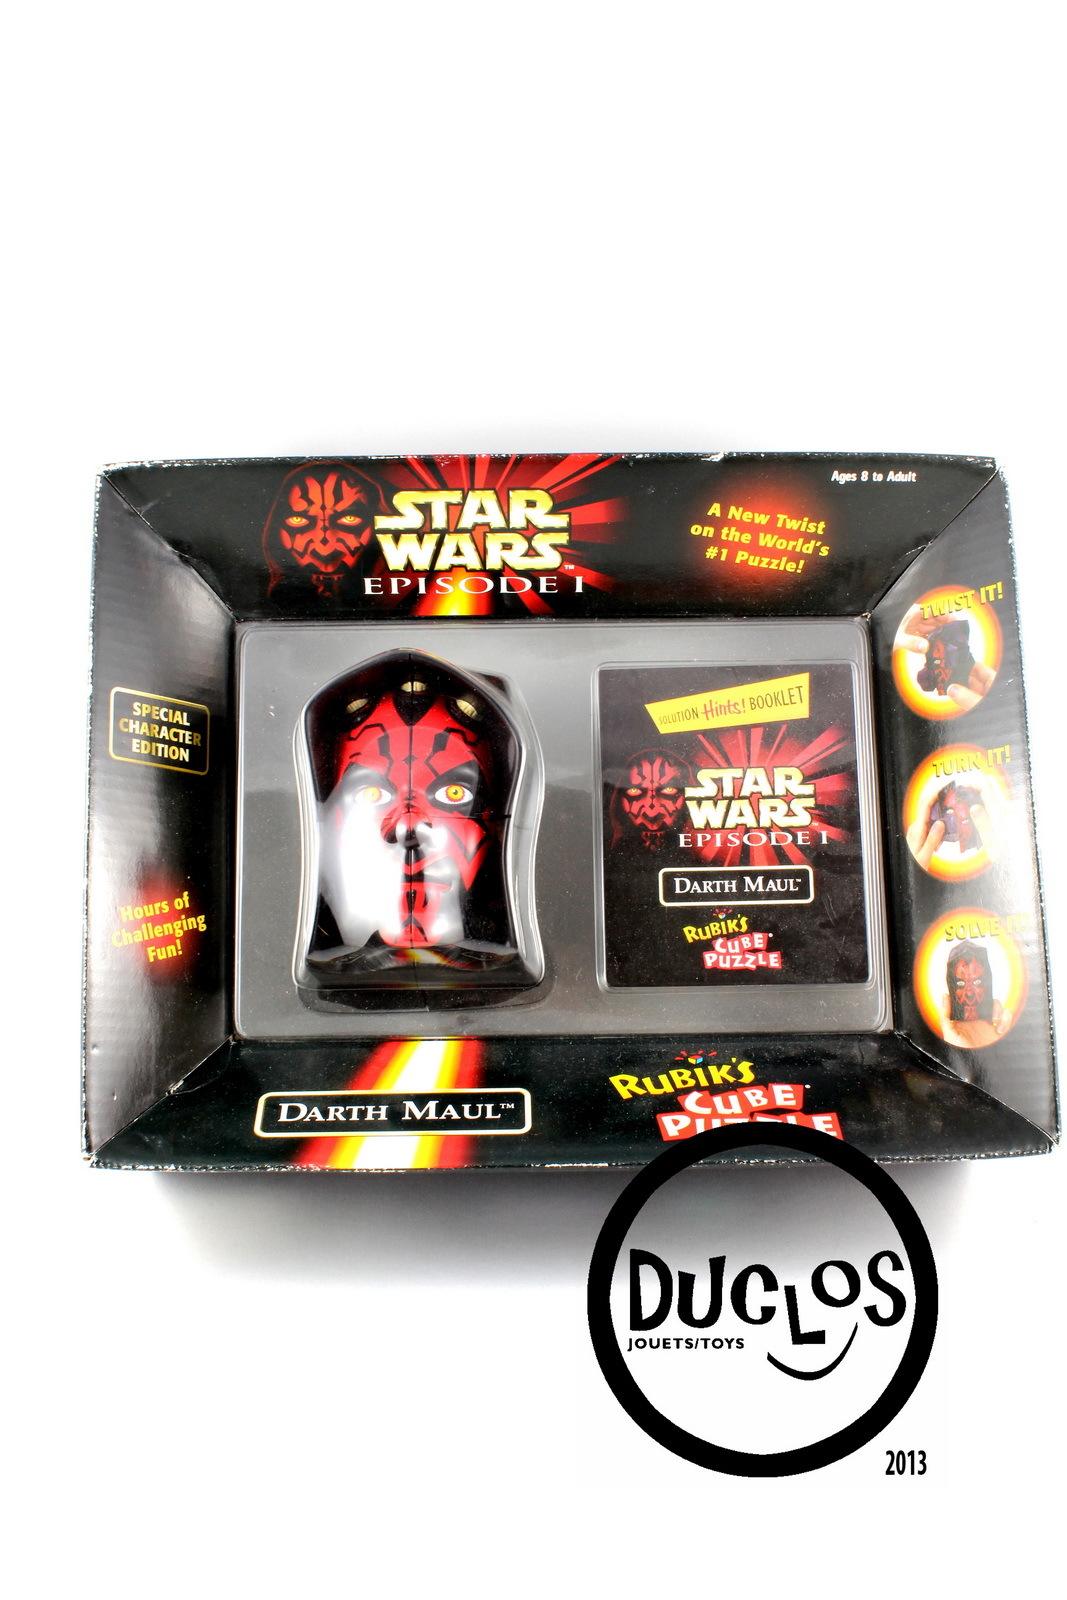 Duclos Toys Action Figures Collectibles Geek Toys